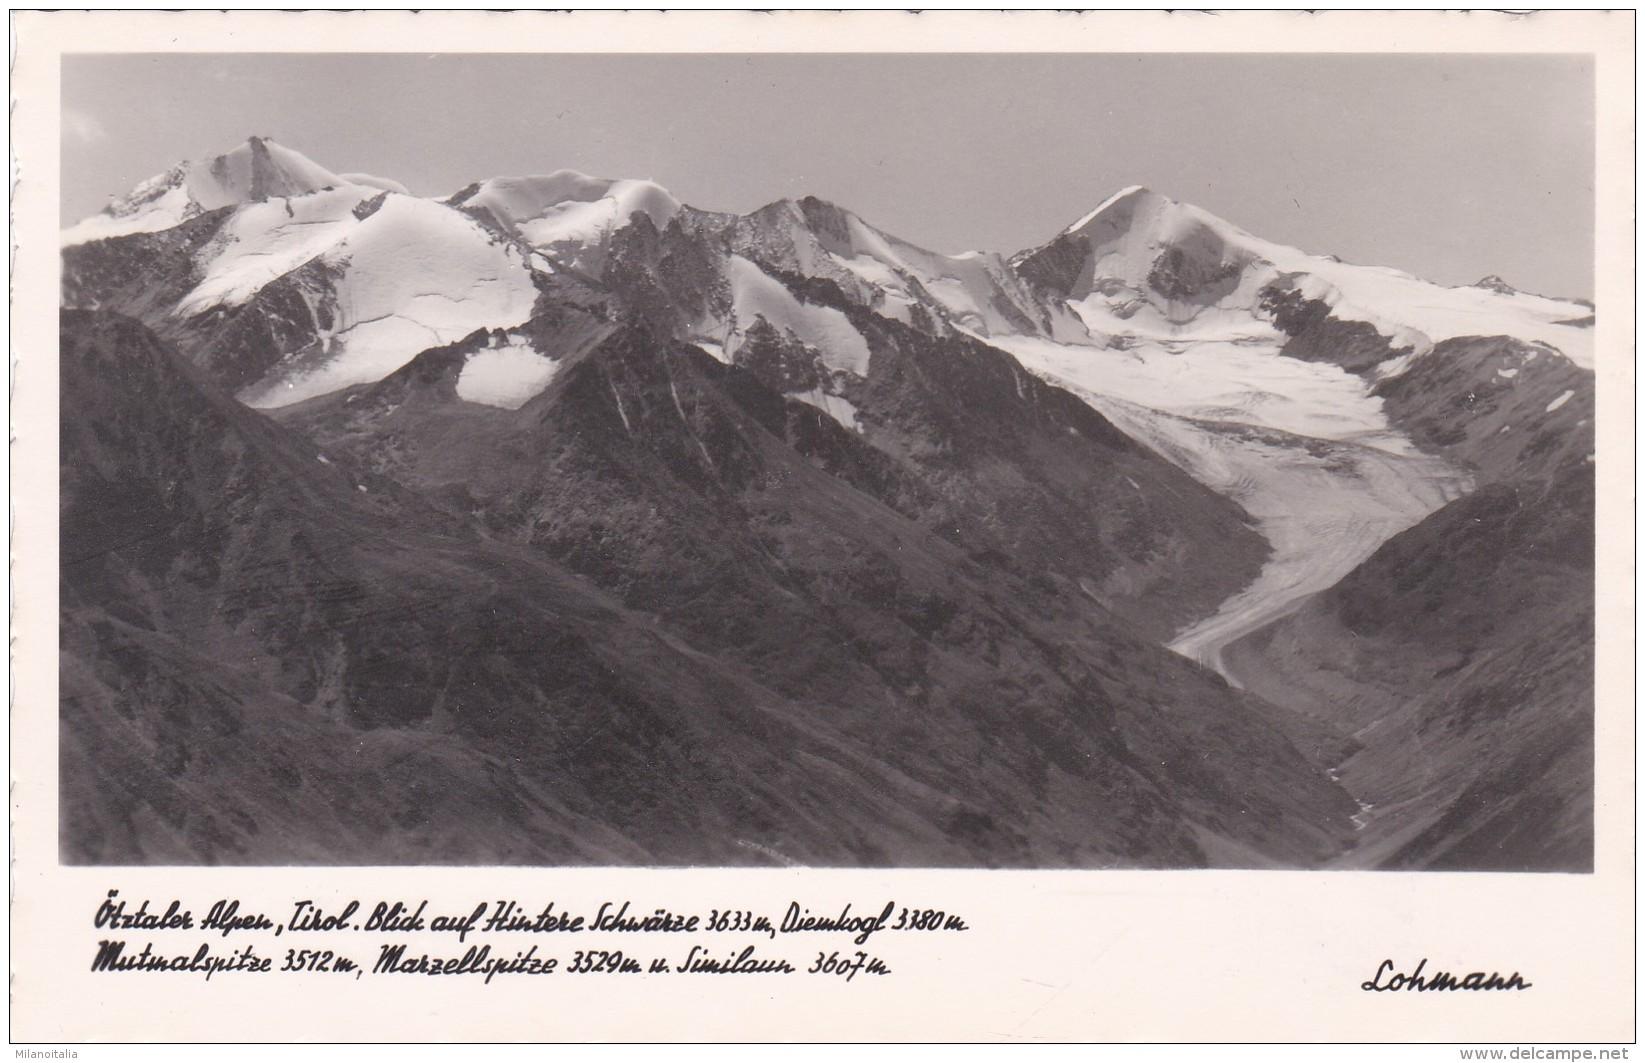 Blick Auf Hintere Schwärze, Diemkogl, Mutmalspitze, Marzellspitze U. Similaun - Ötztaler Alpen, Tirol (55/8) - Sölden